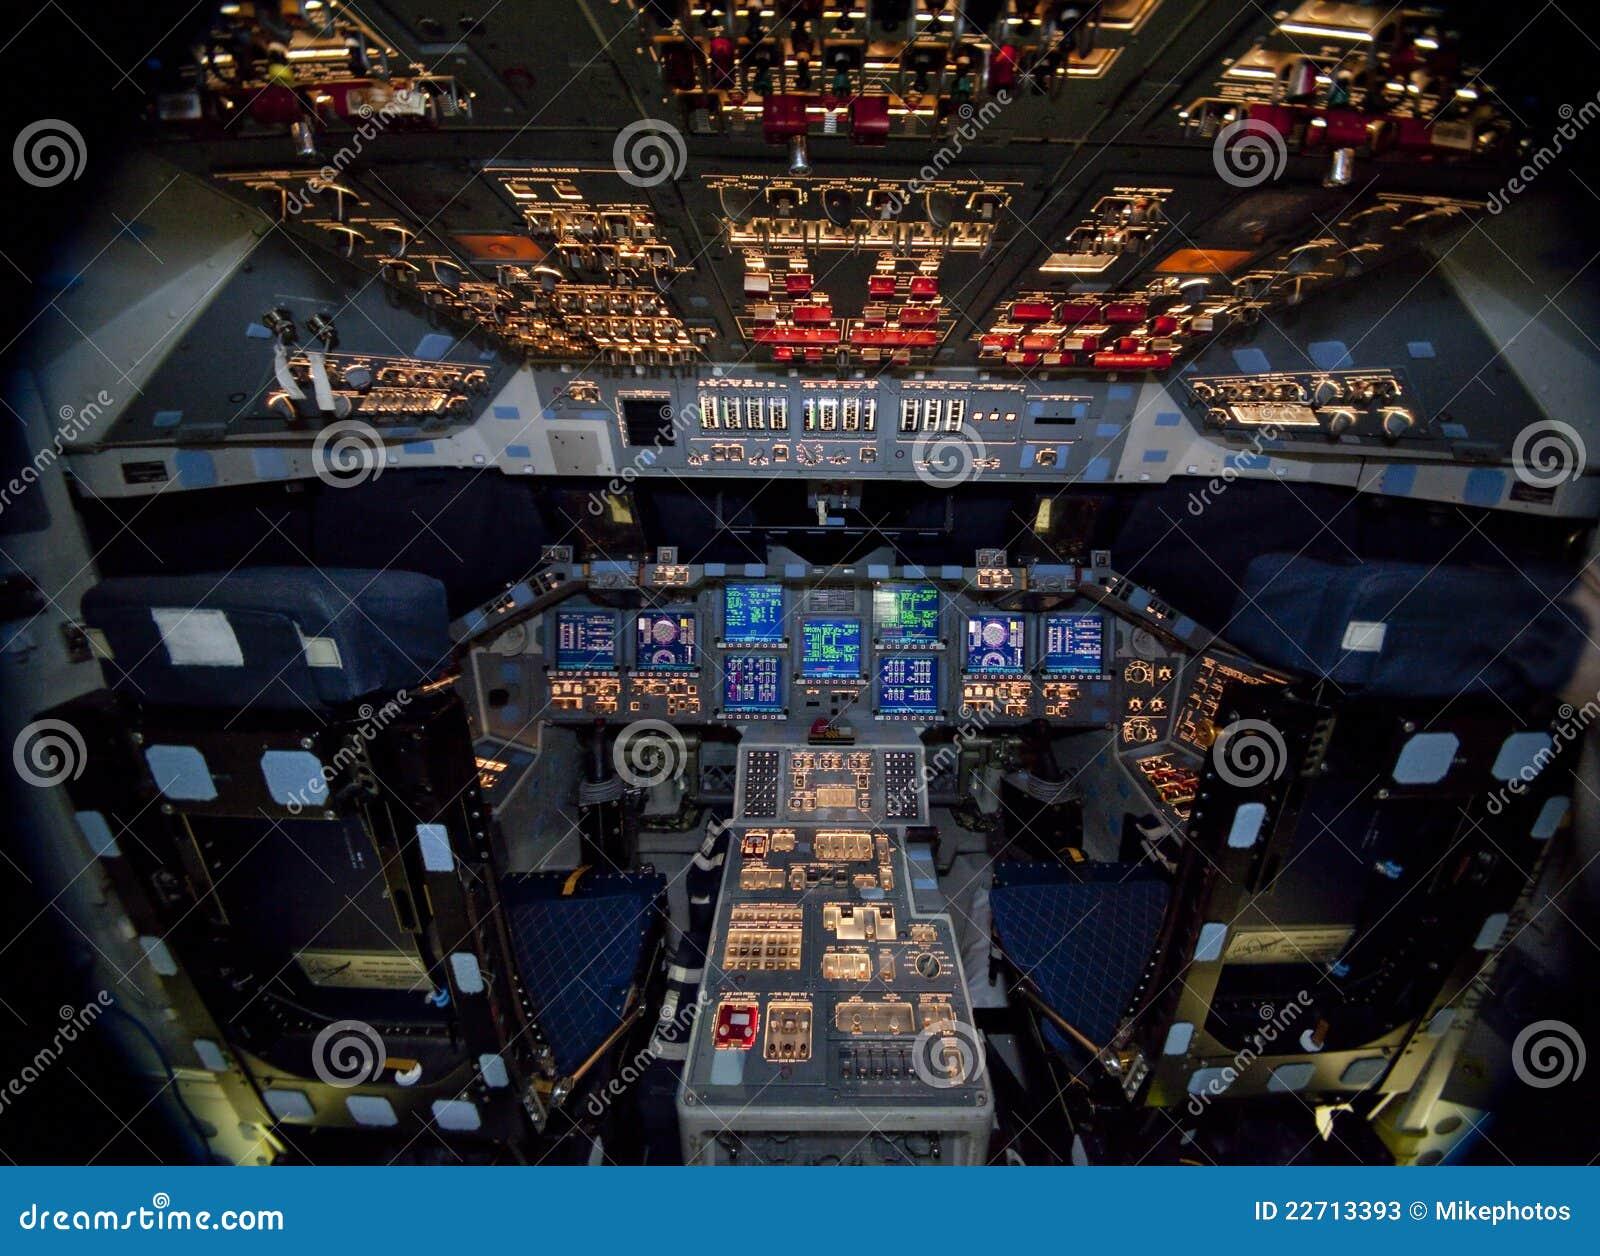 Space Shuttle Atlantis Editorial Stock Photo - Image: 22713393